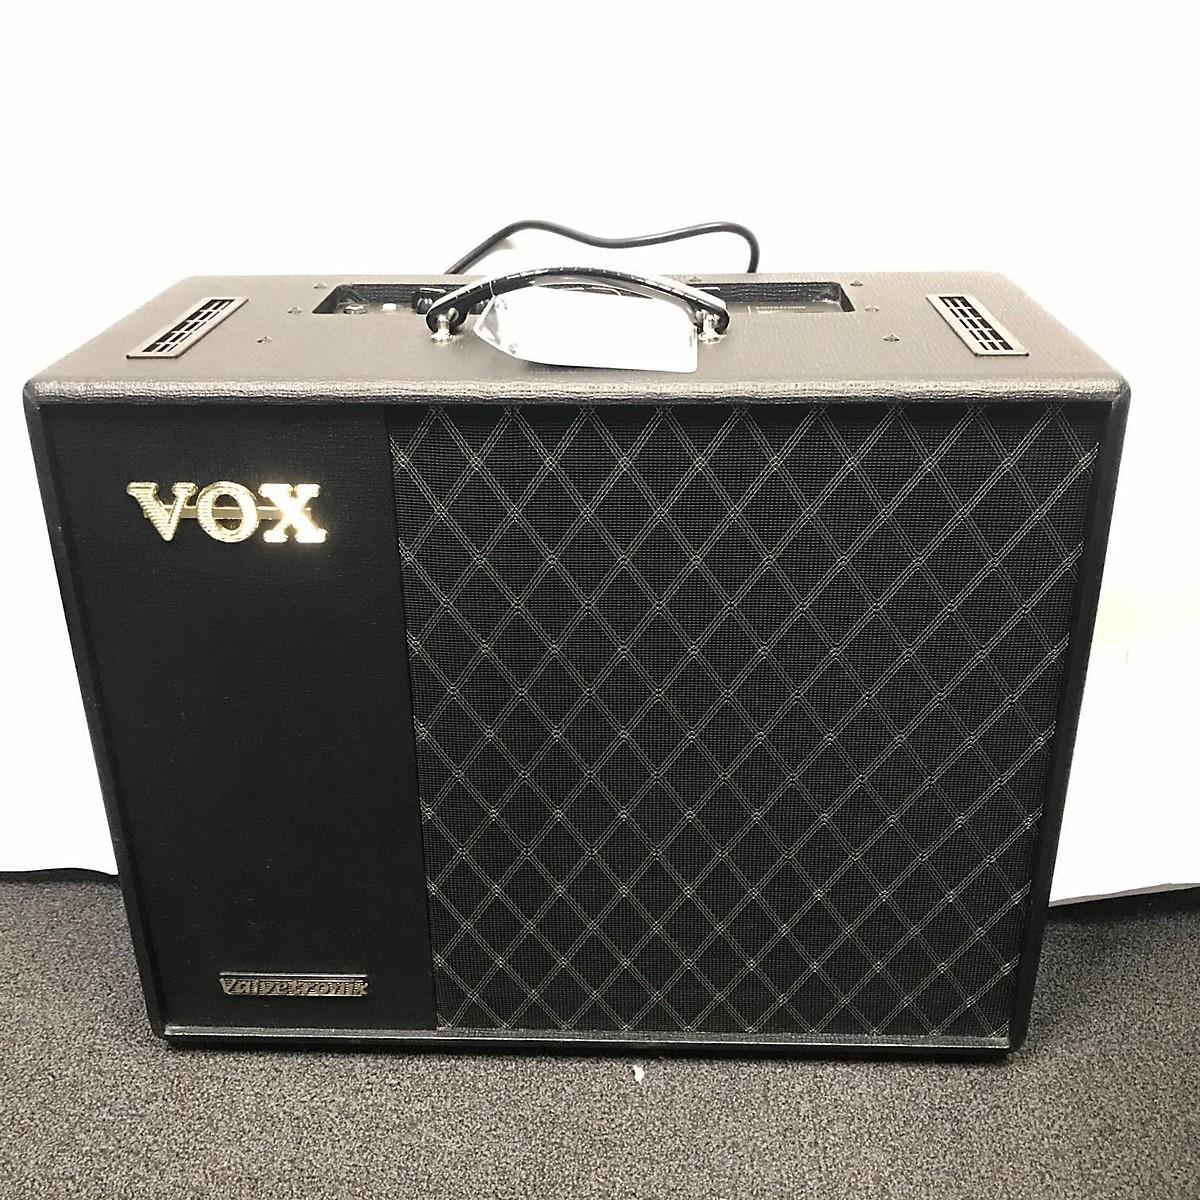 Vox Valvetronix VT100X 100W 1x12 Guitar Combo Amp